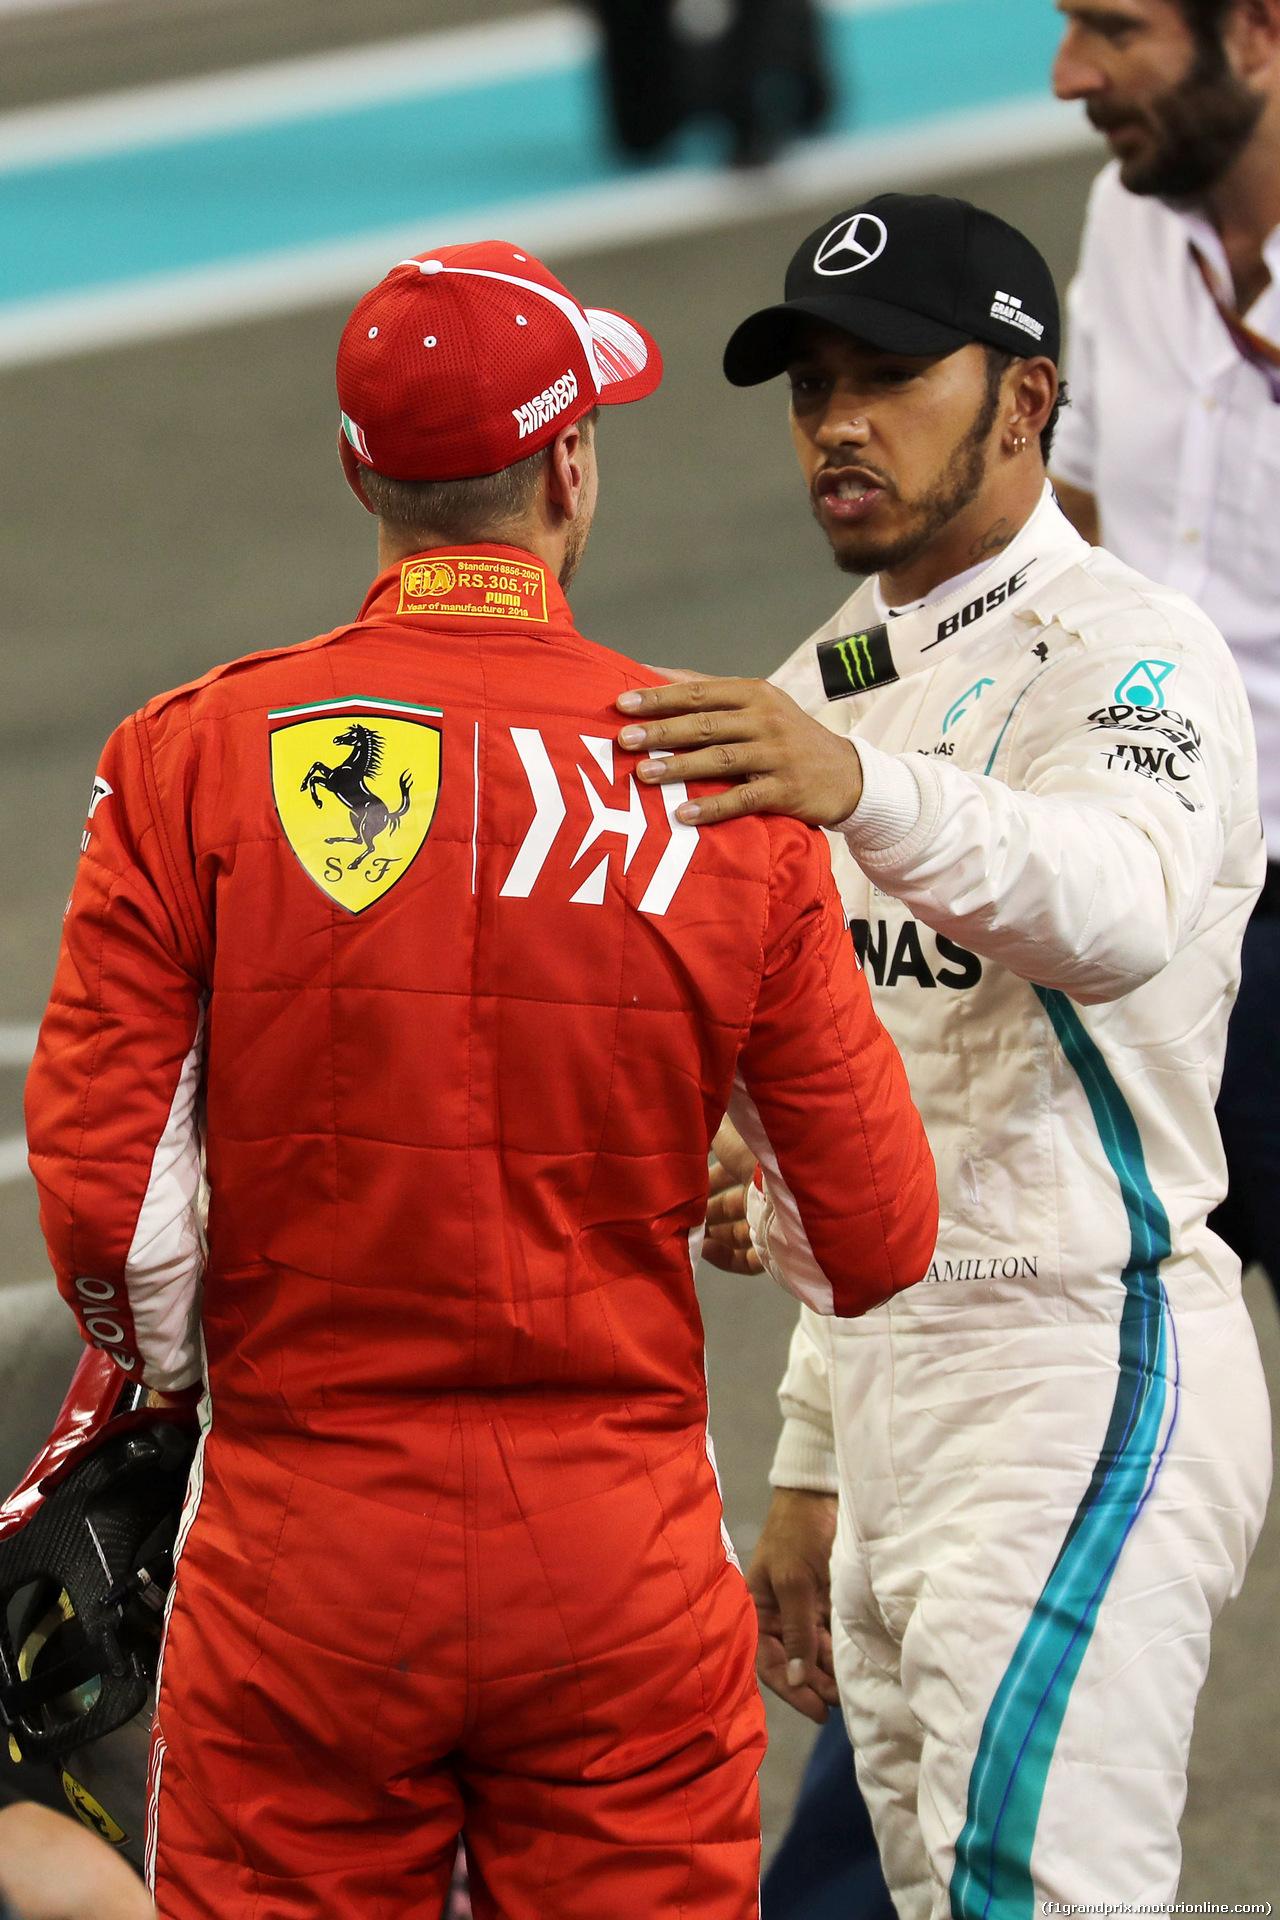 GP ABU DHABI, 24.11.2018 - Qualifiche, 3rd place Sebastian Vettel (GER) Ferrari SF71H e Lewis Hamilton (GBR) Mercedes AMG F1 W09 pole position